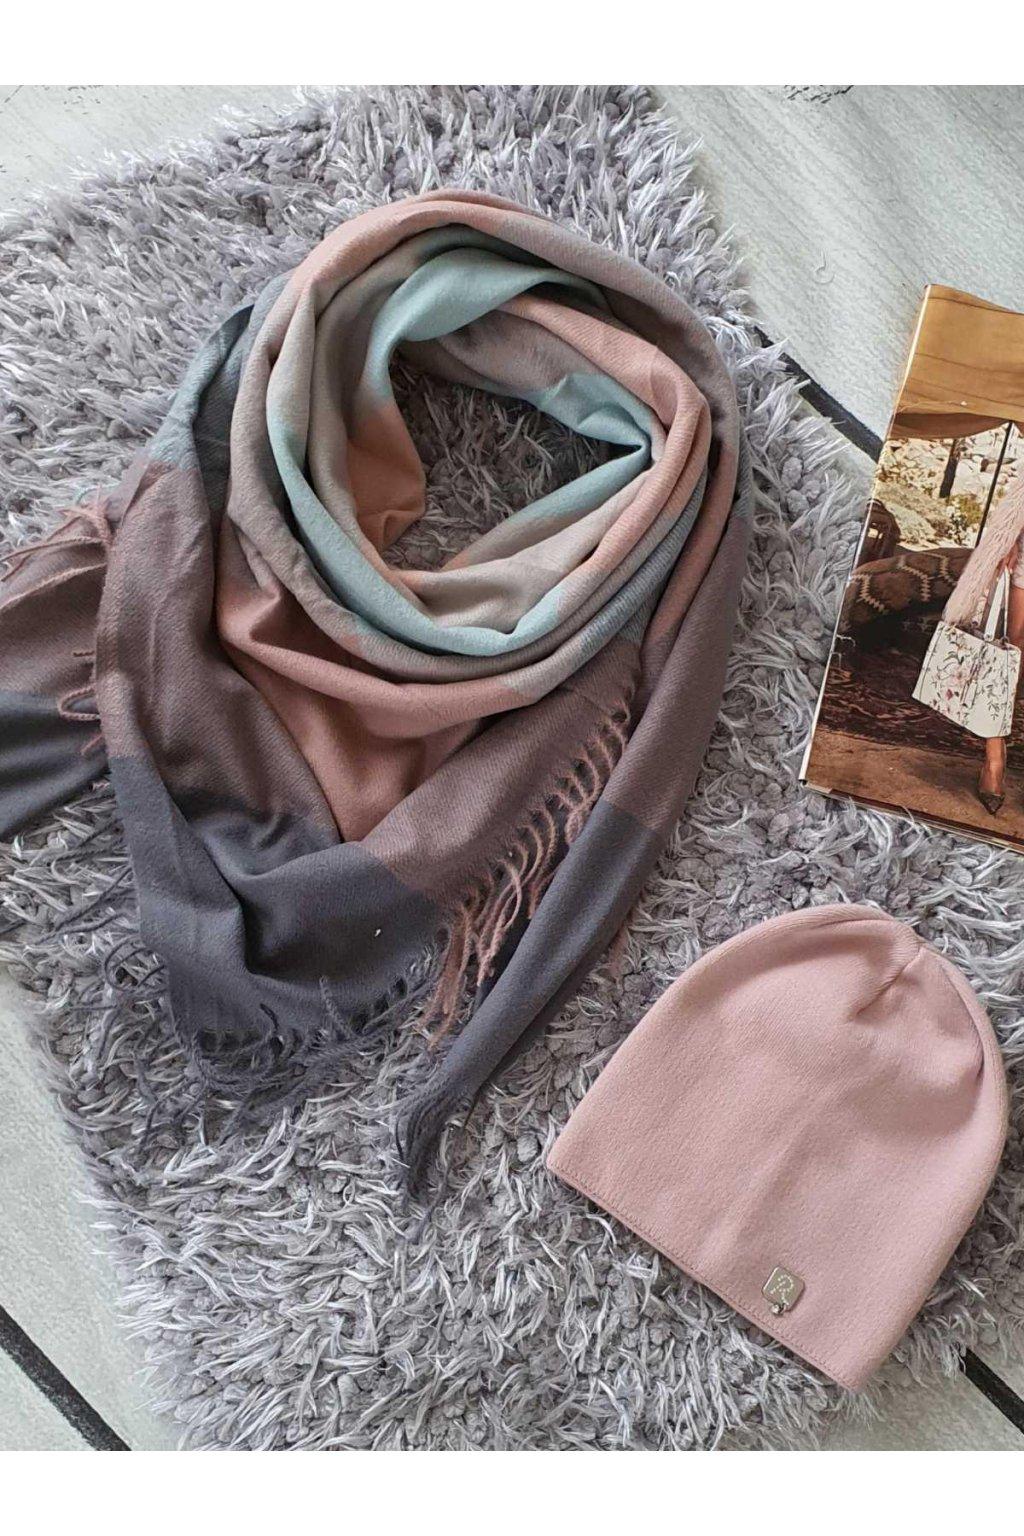 sladěný set čepice a maxišátku tip na dárek do růžova do mentolové barvy